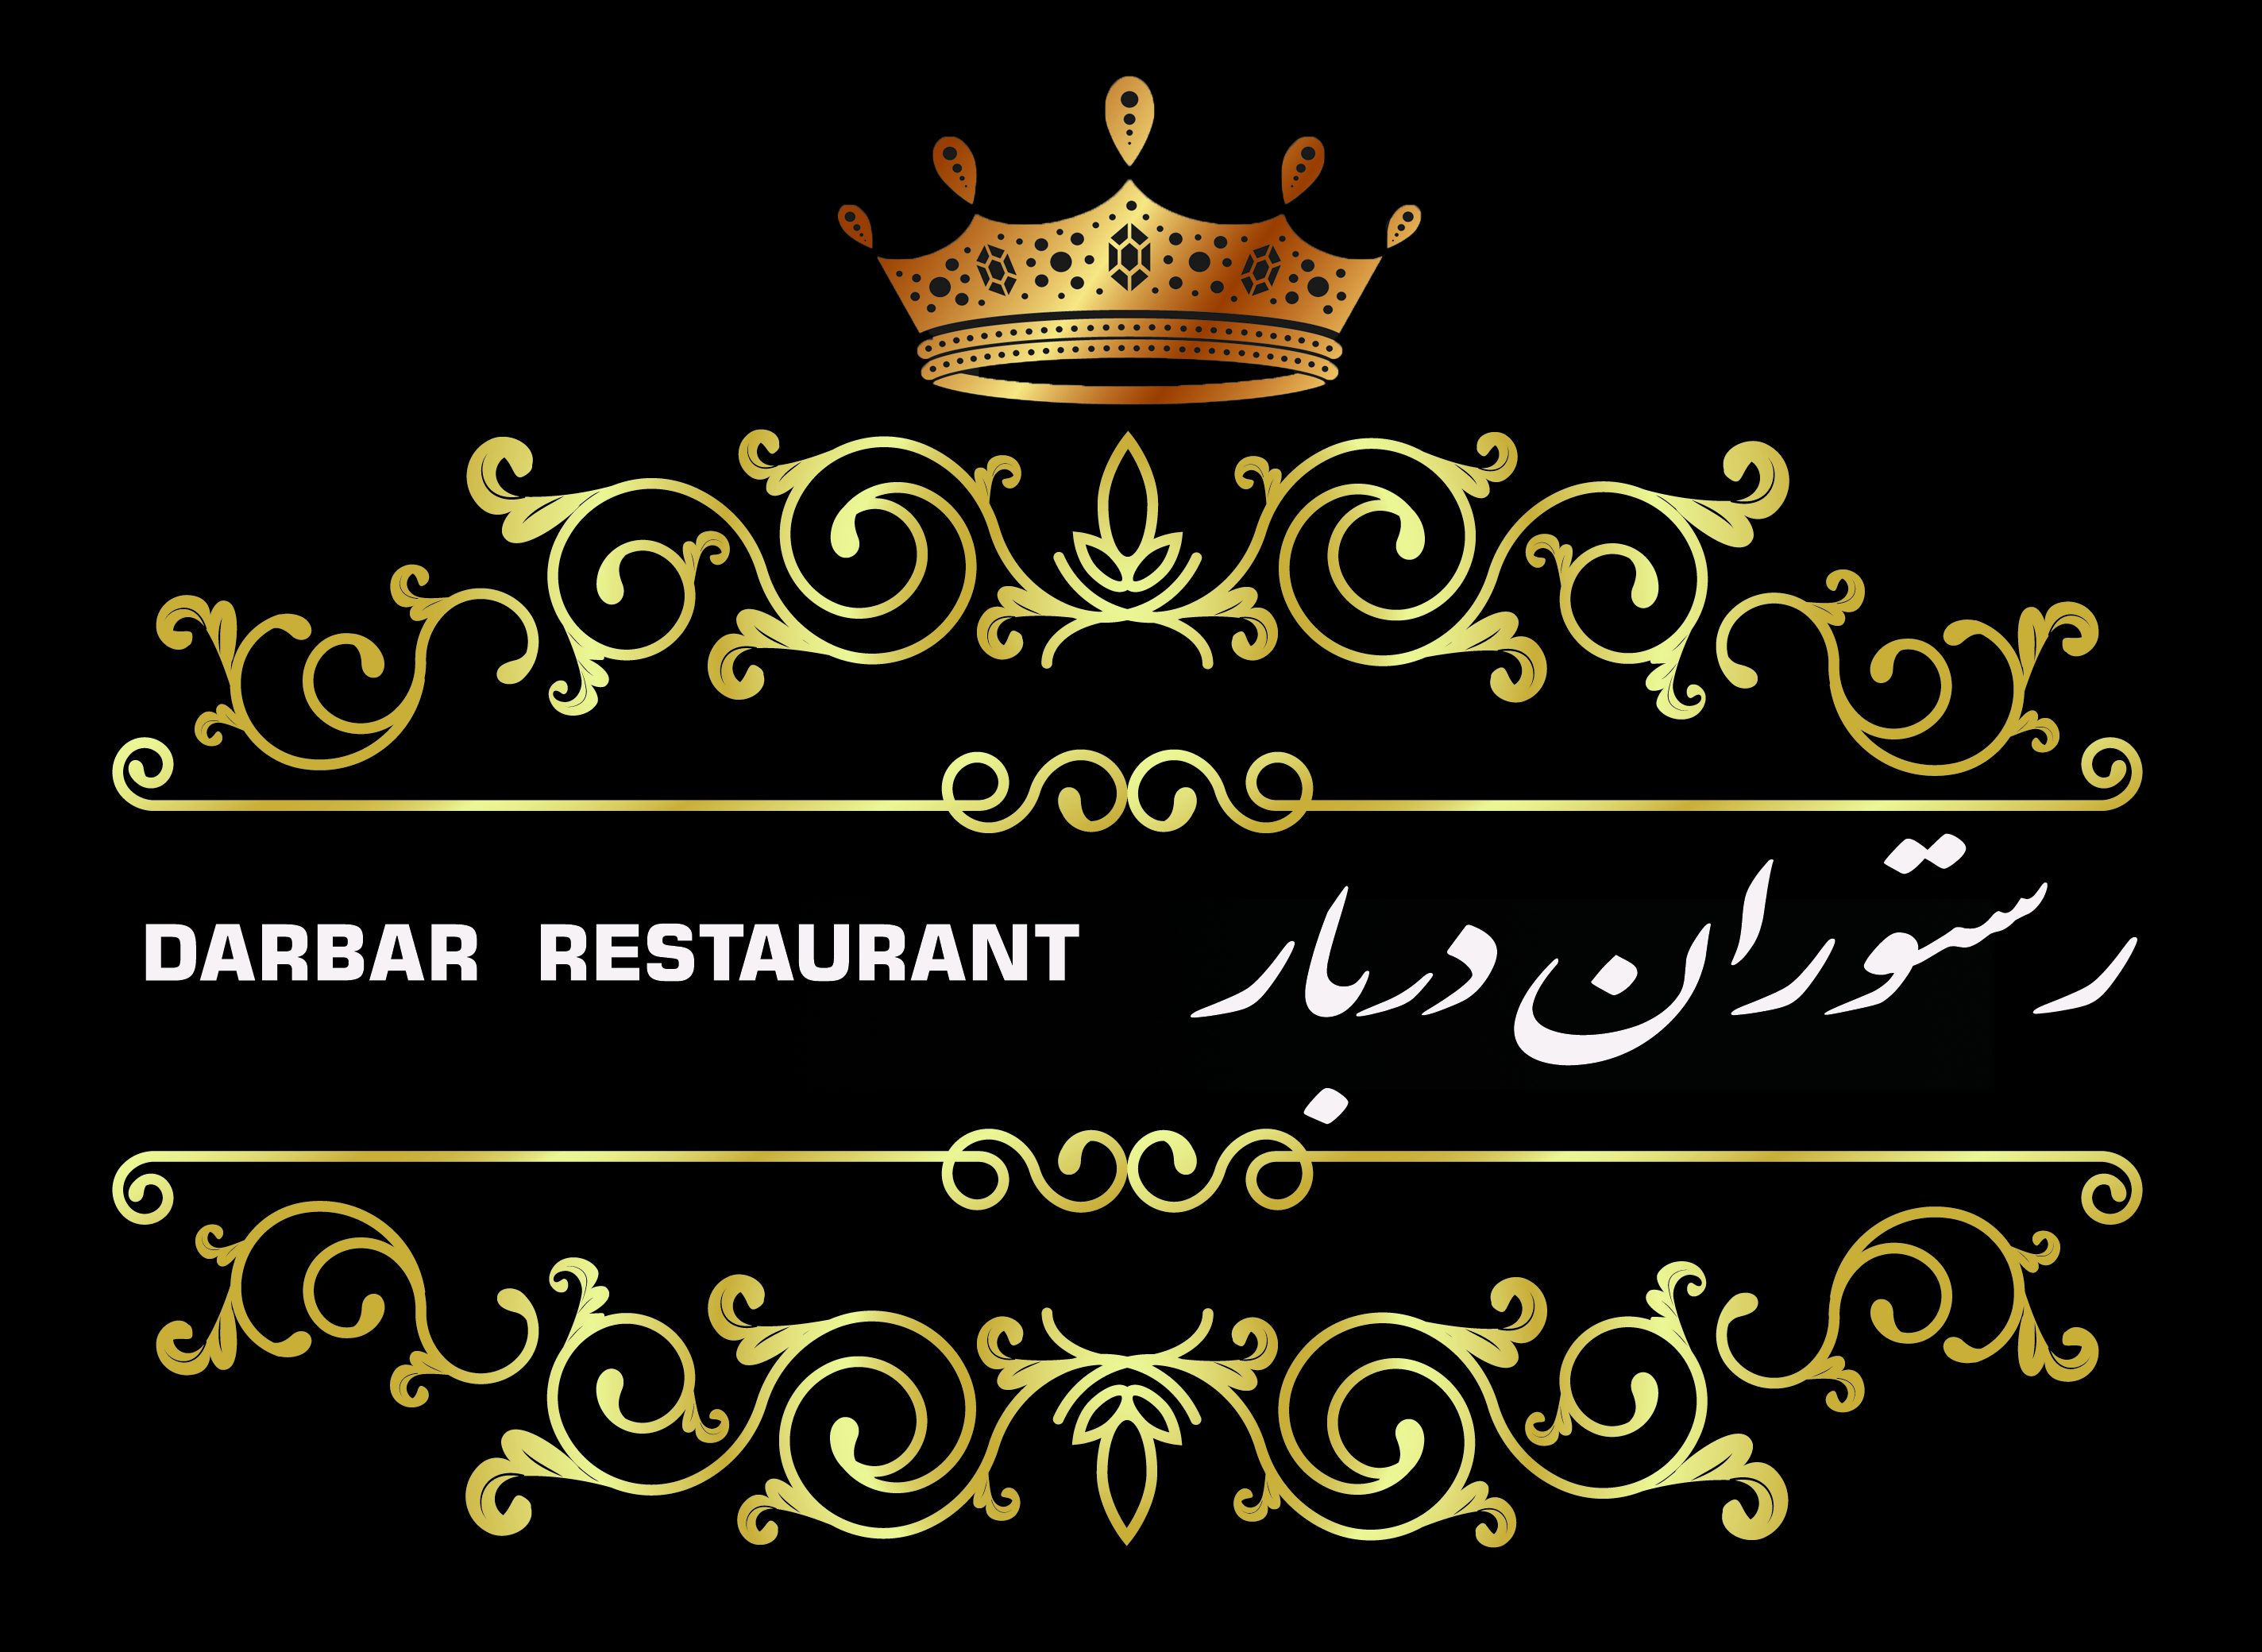 Darbar Restaurant Düsseldorf